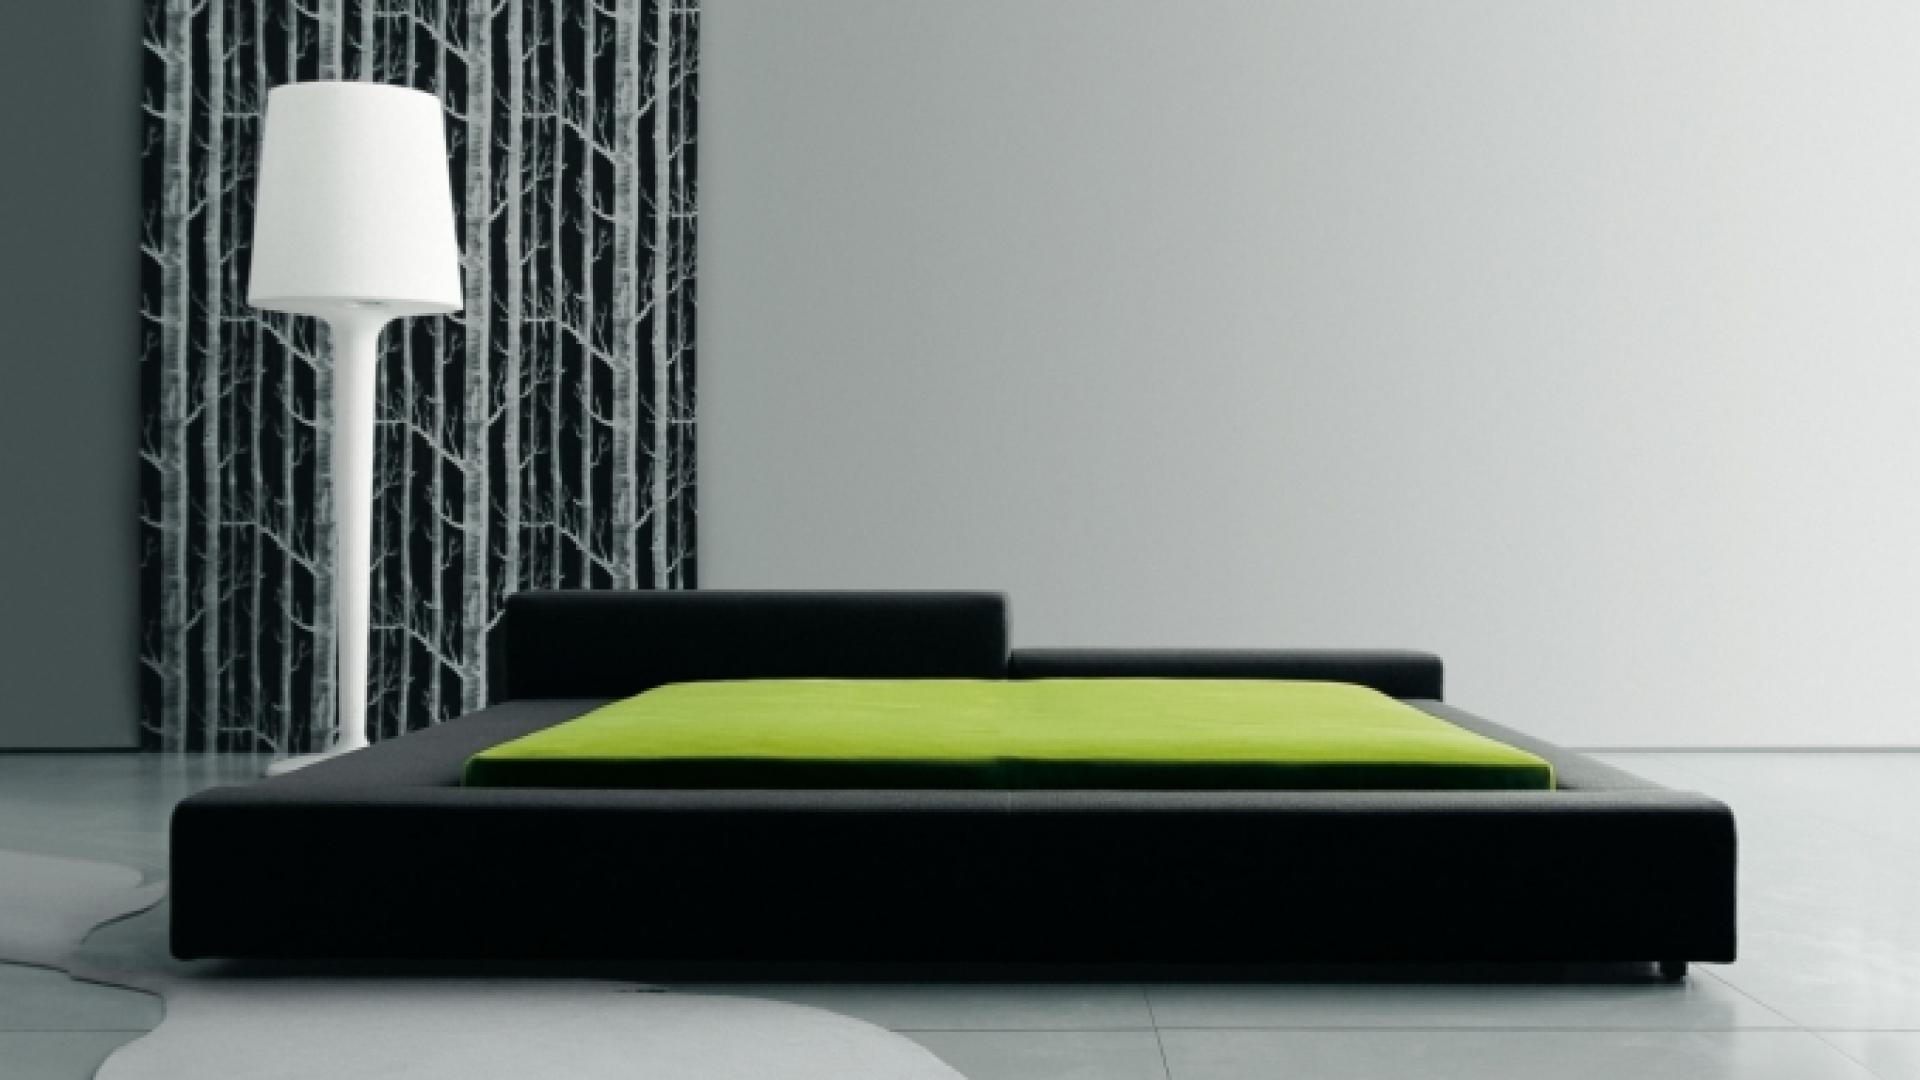 Extra_Wall_Living_Divani_bed_2.jpg